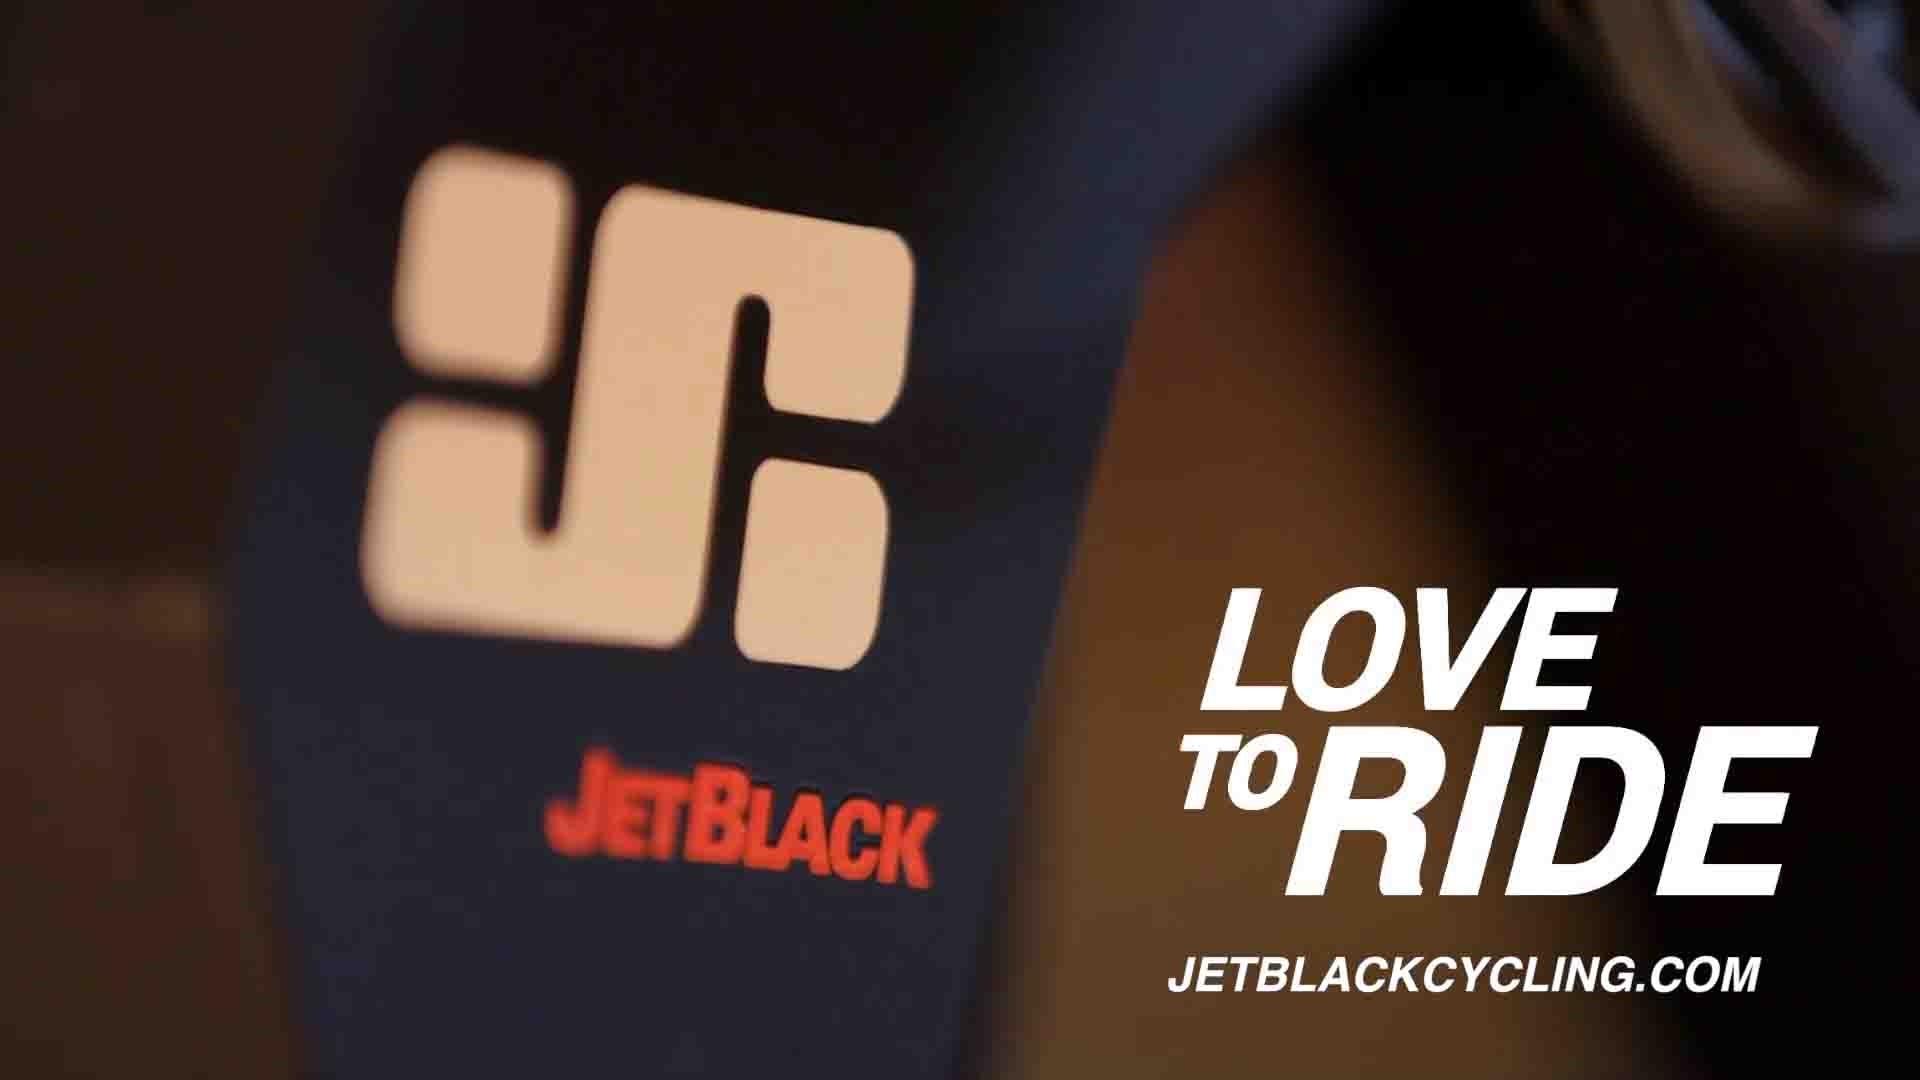 The NEW JetBLack VOLT- It's Insanely Quiet!